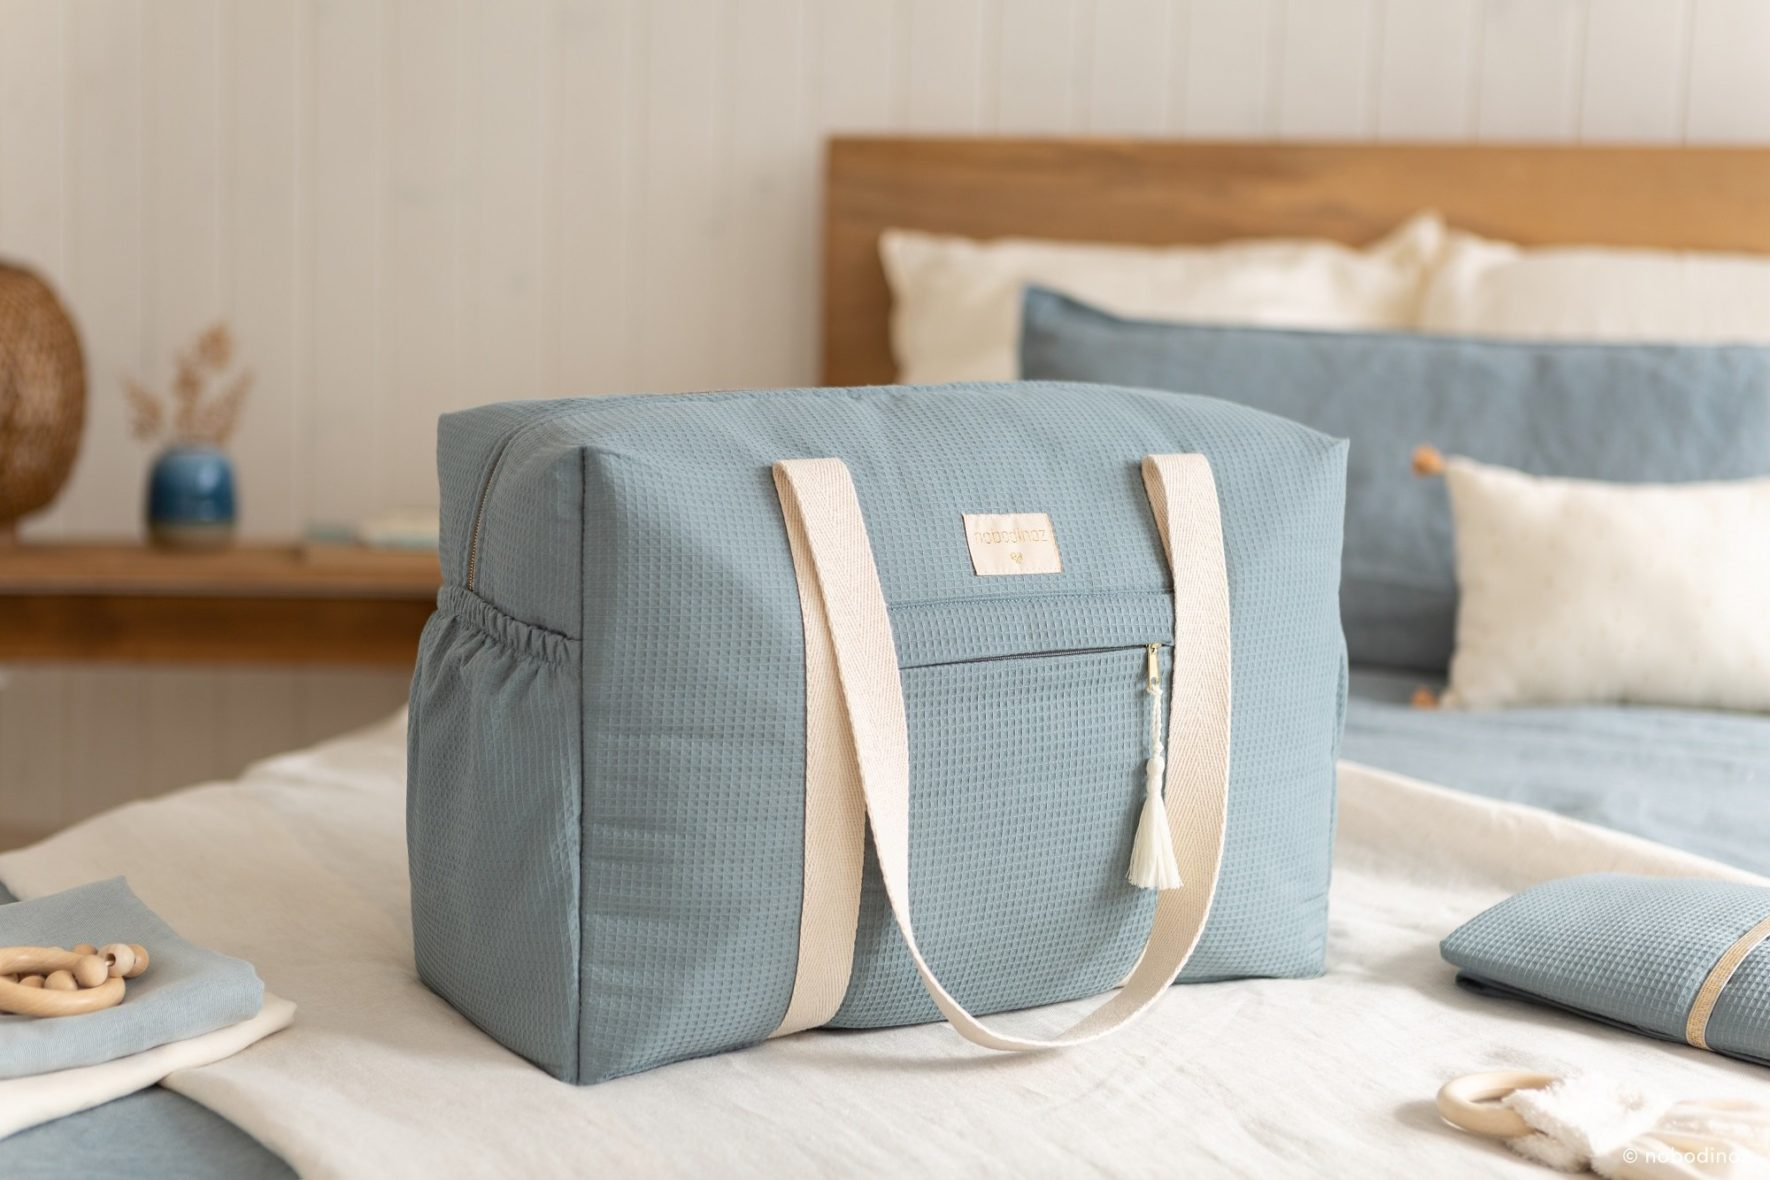 Opera Waterproof Maternity Bag Stone Blue Nobodinoz 2 8435574919236